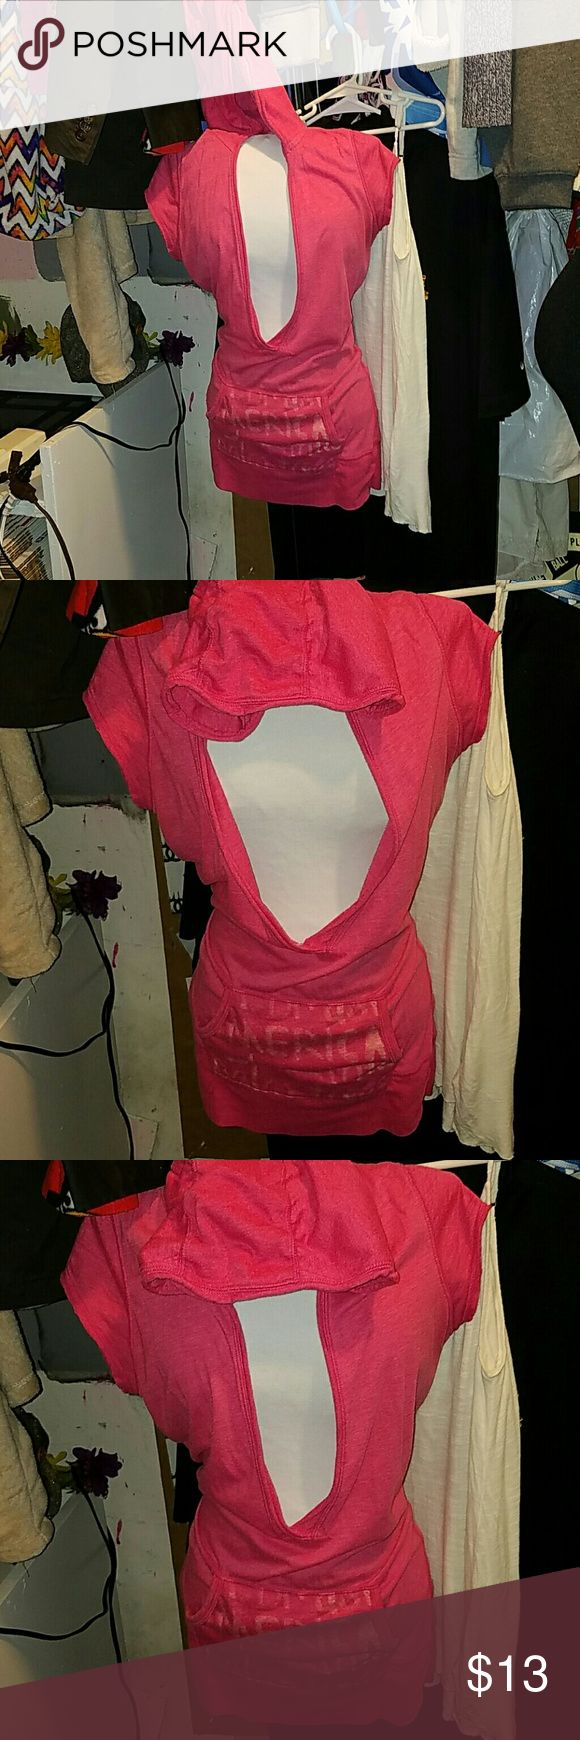 American Eagle outfitters med sleeveless hoodie In excellent condition American Eagle Outfitters medium pink hoodie American Eagle Outfitters Tops Sweatshirts & Hoodies